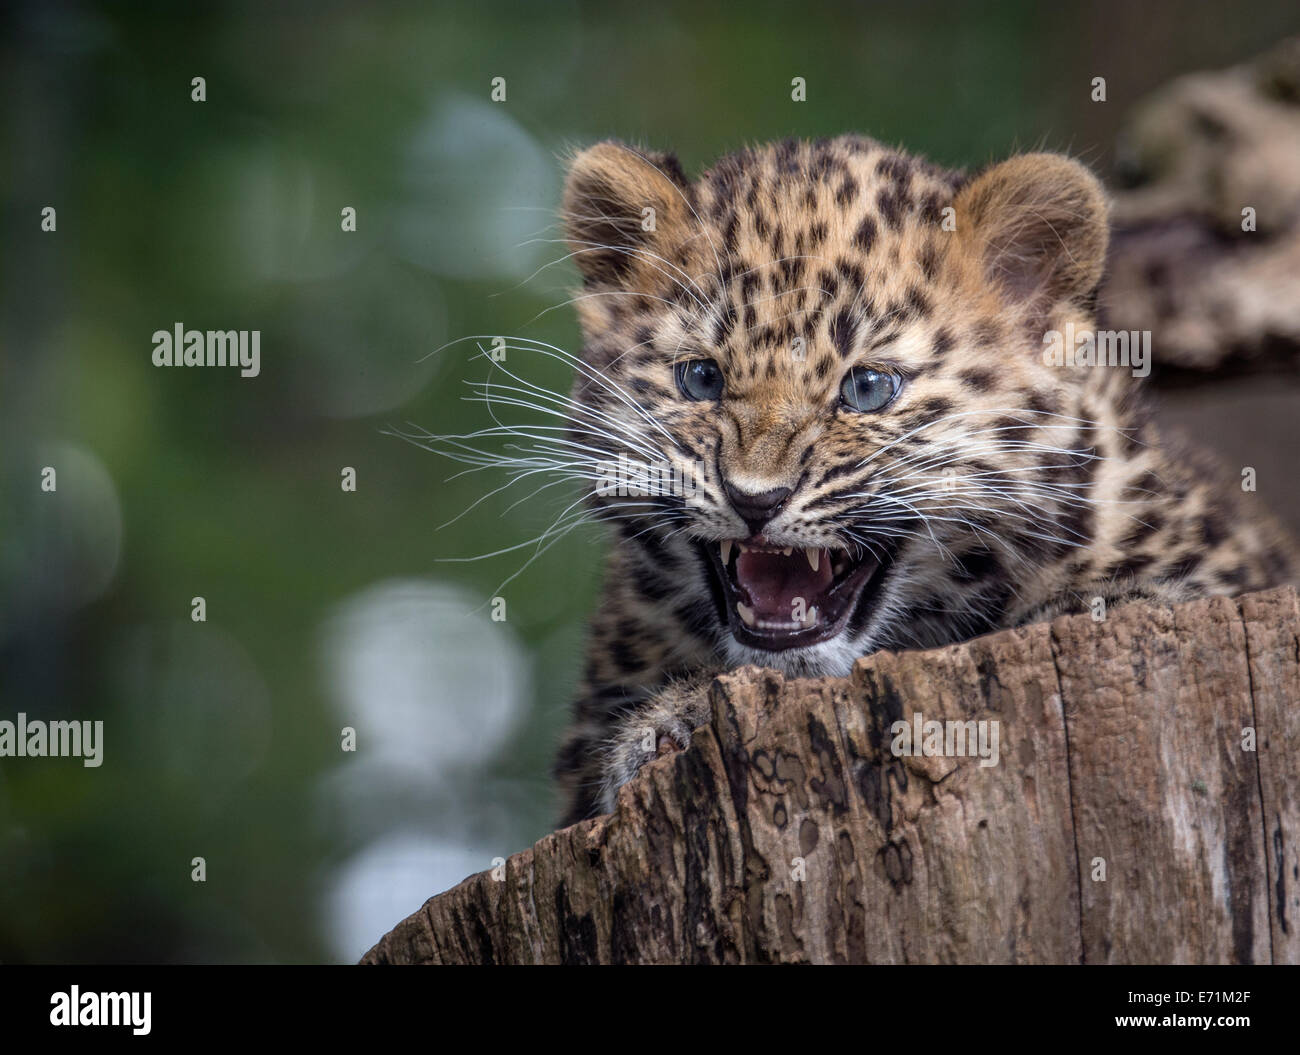 Female Amur leopard cub snarling - Stock Image